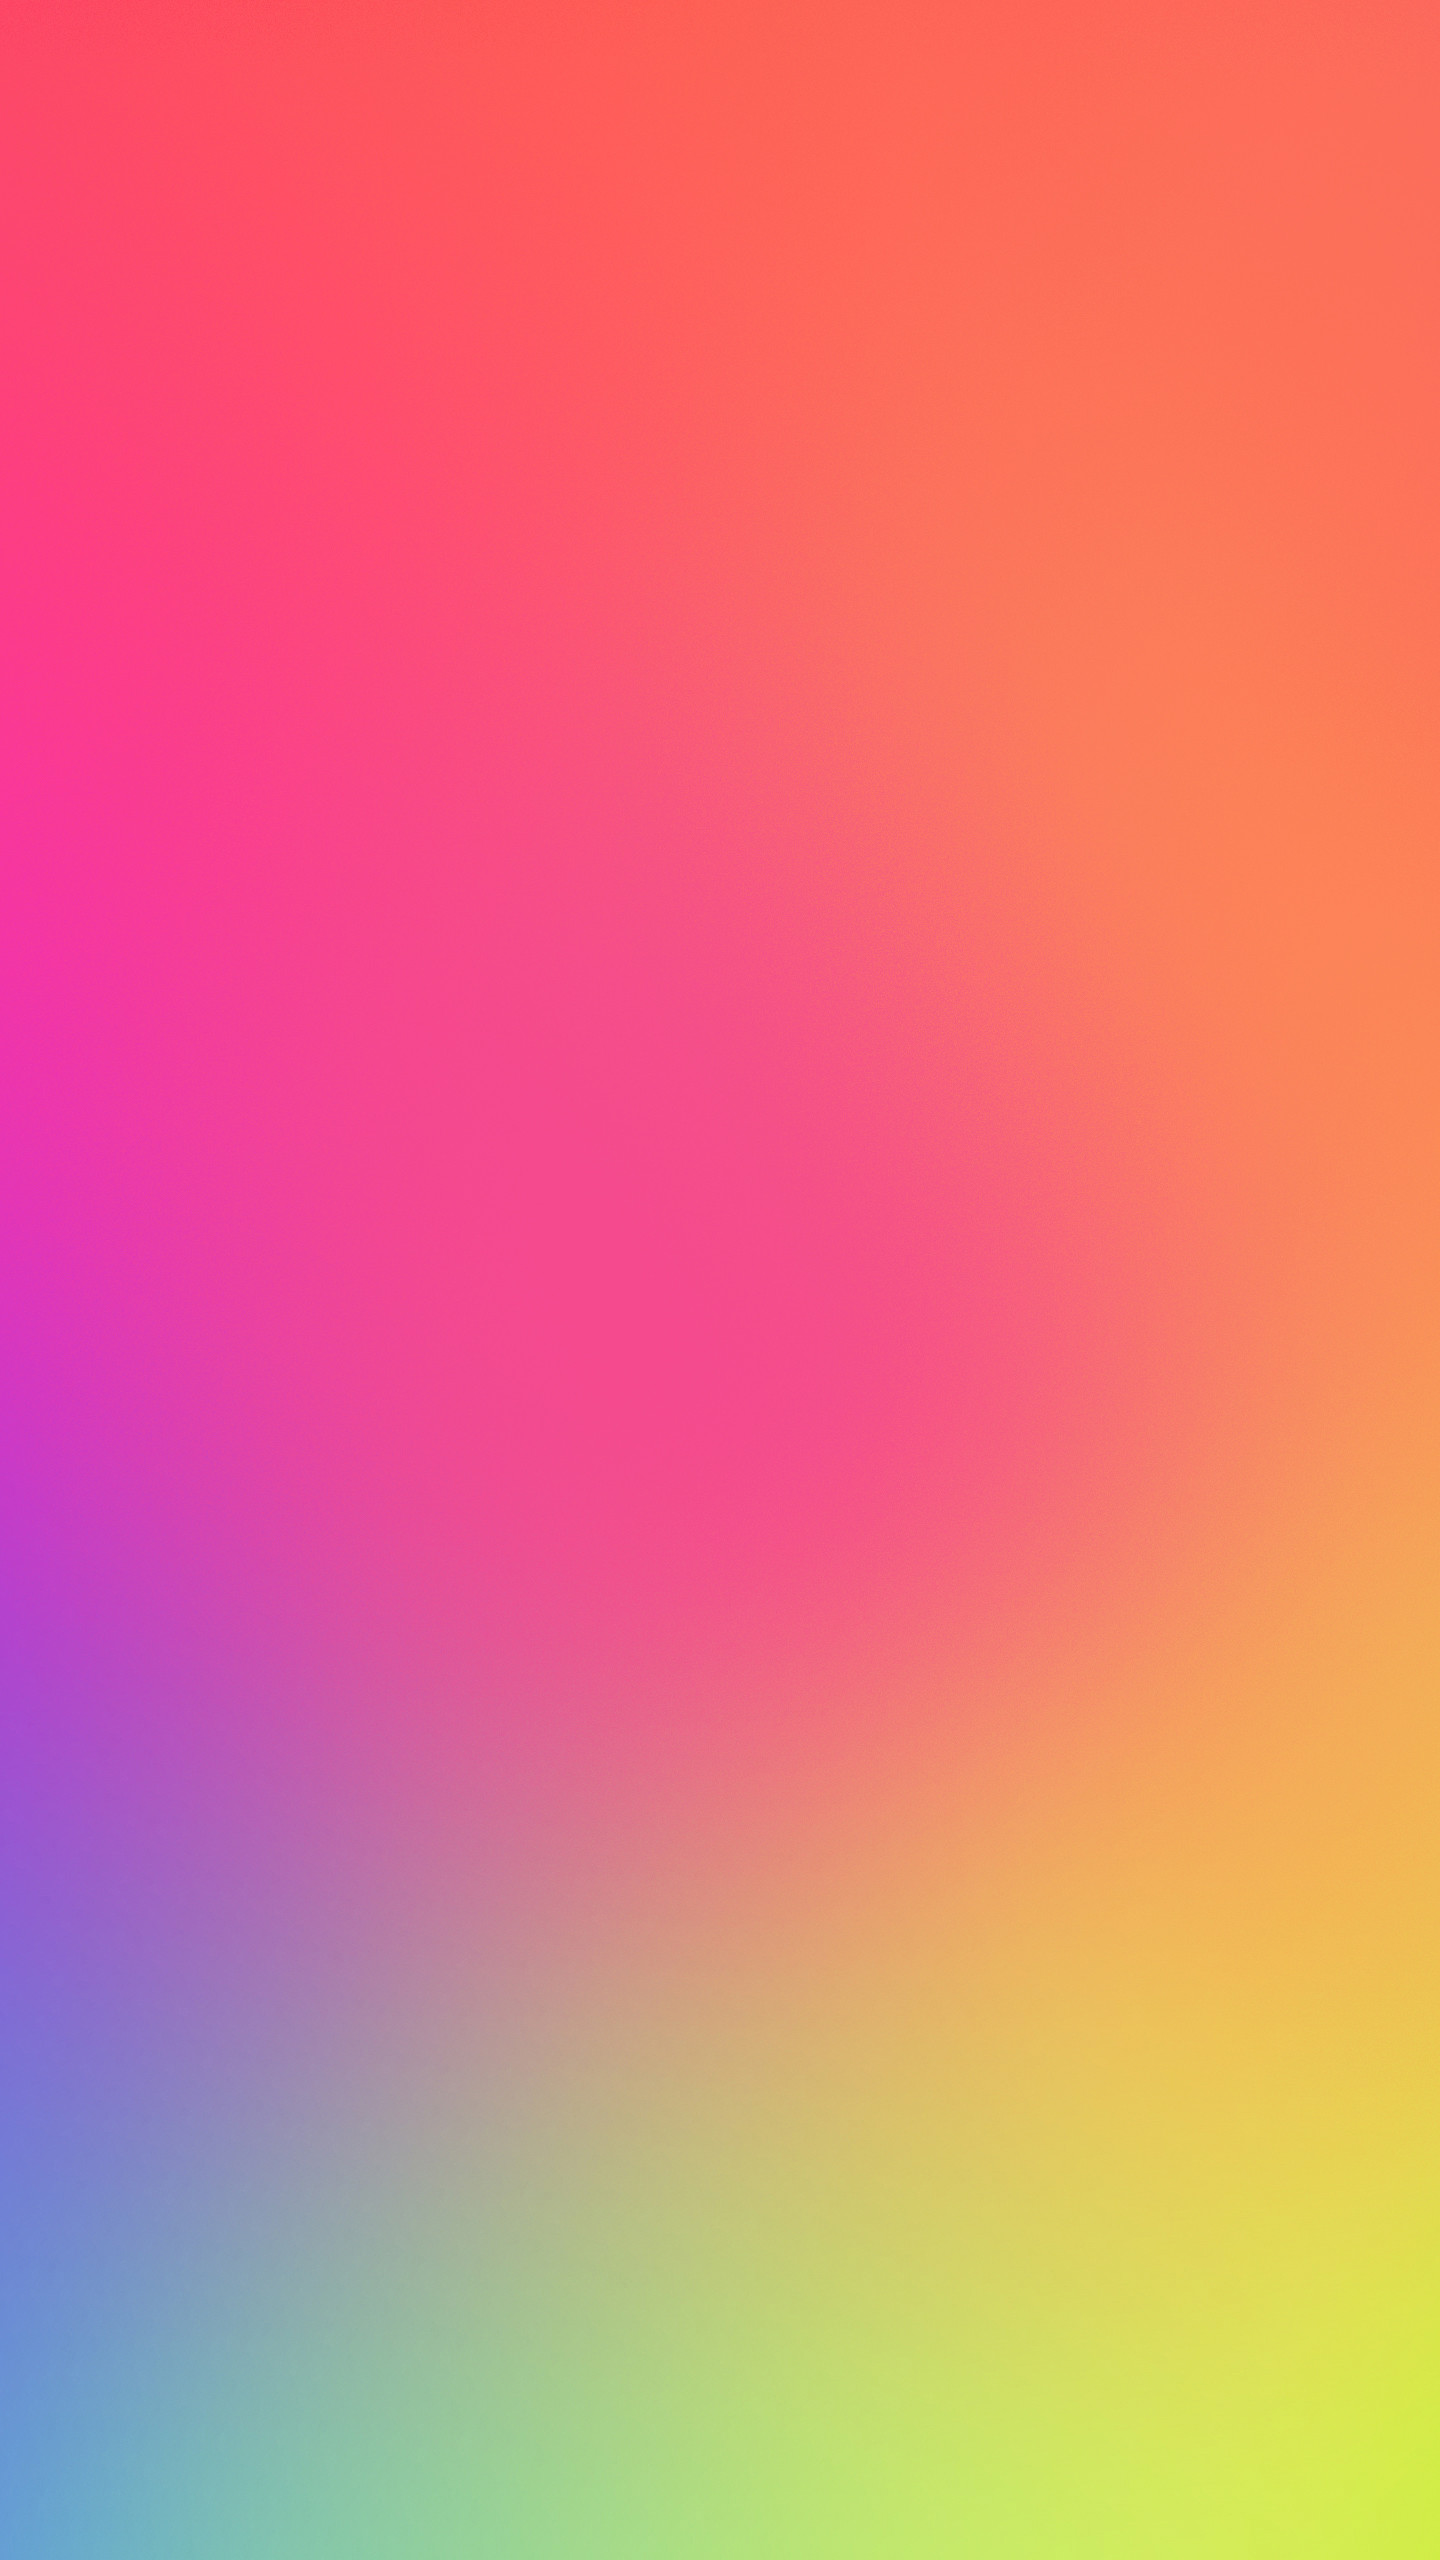 Lg Hd wallpapers - HD wallpaper